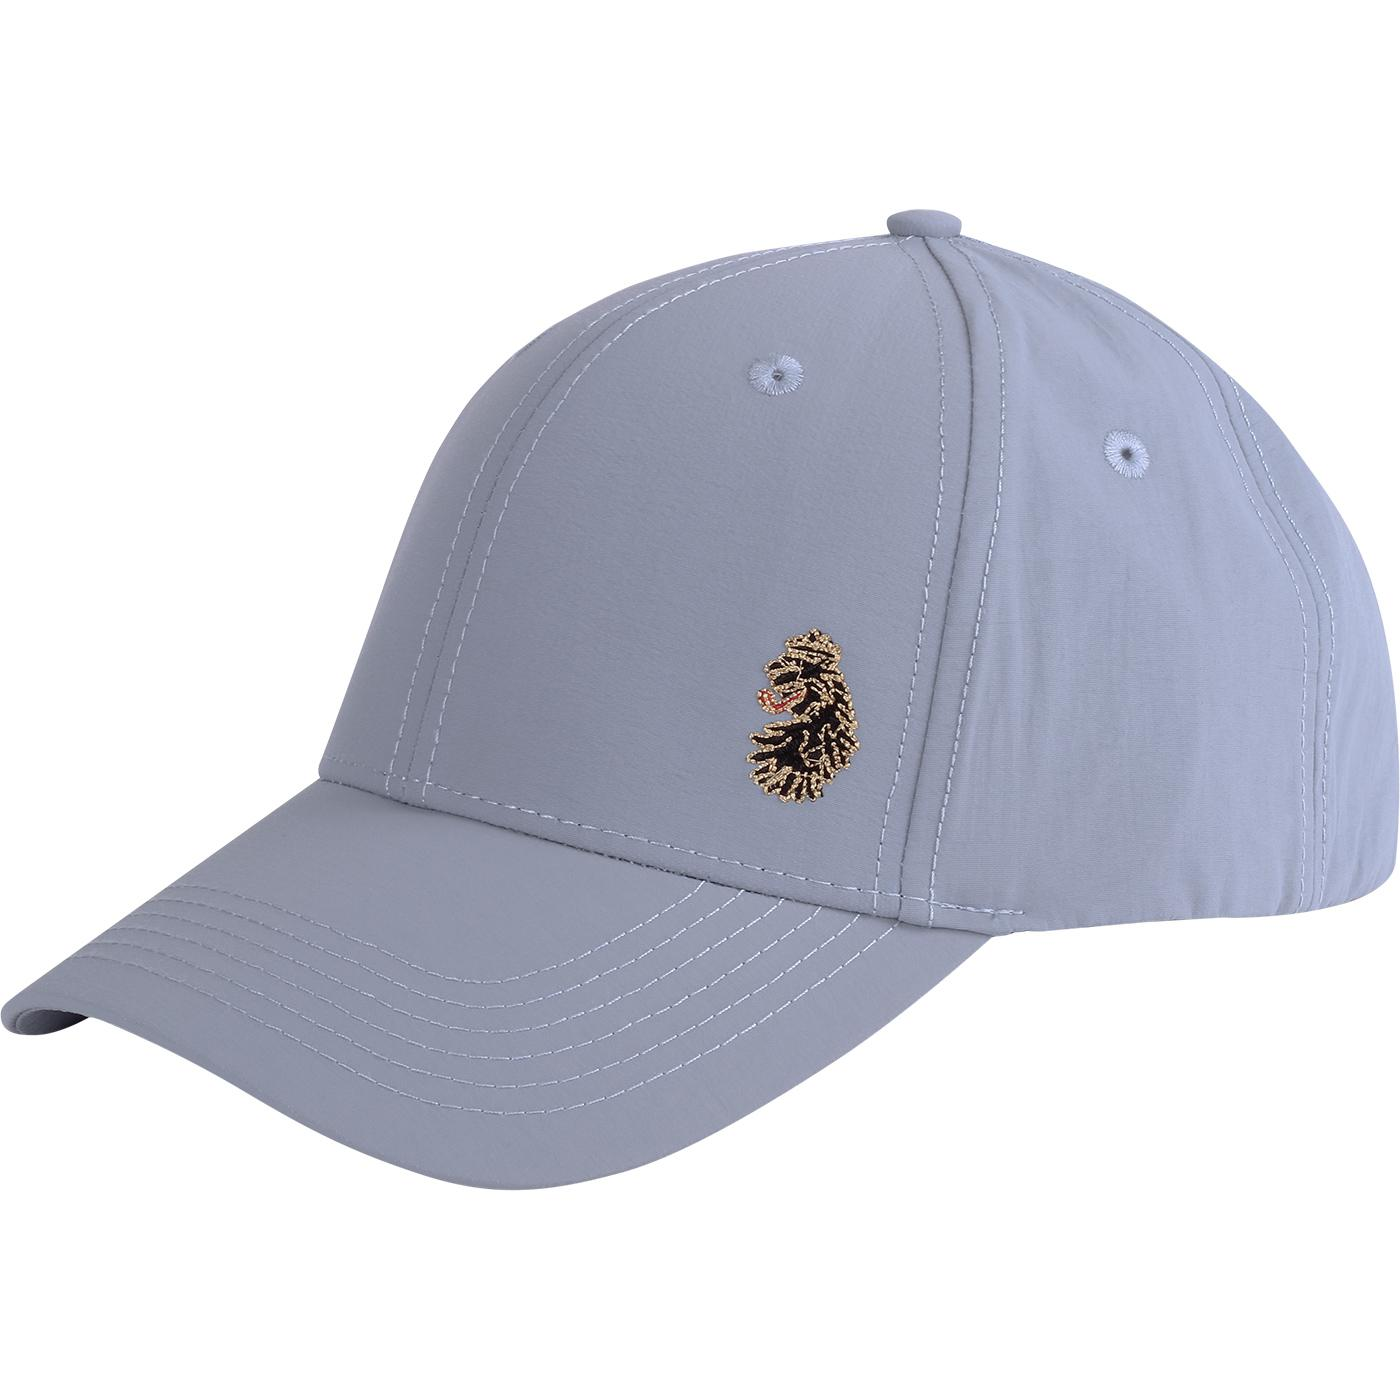 Cousteau LUKE Retro Sport Baseball Cap (Soft Sky)